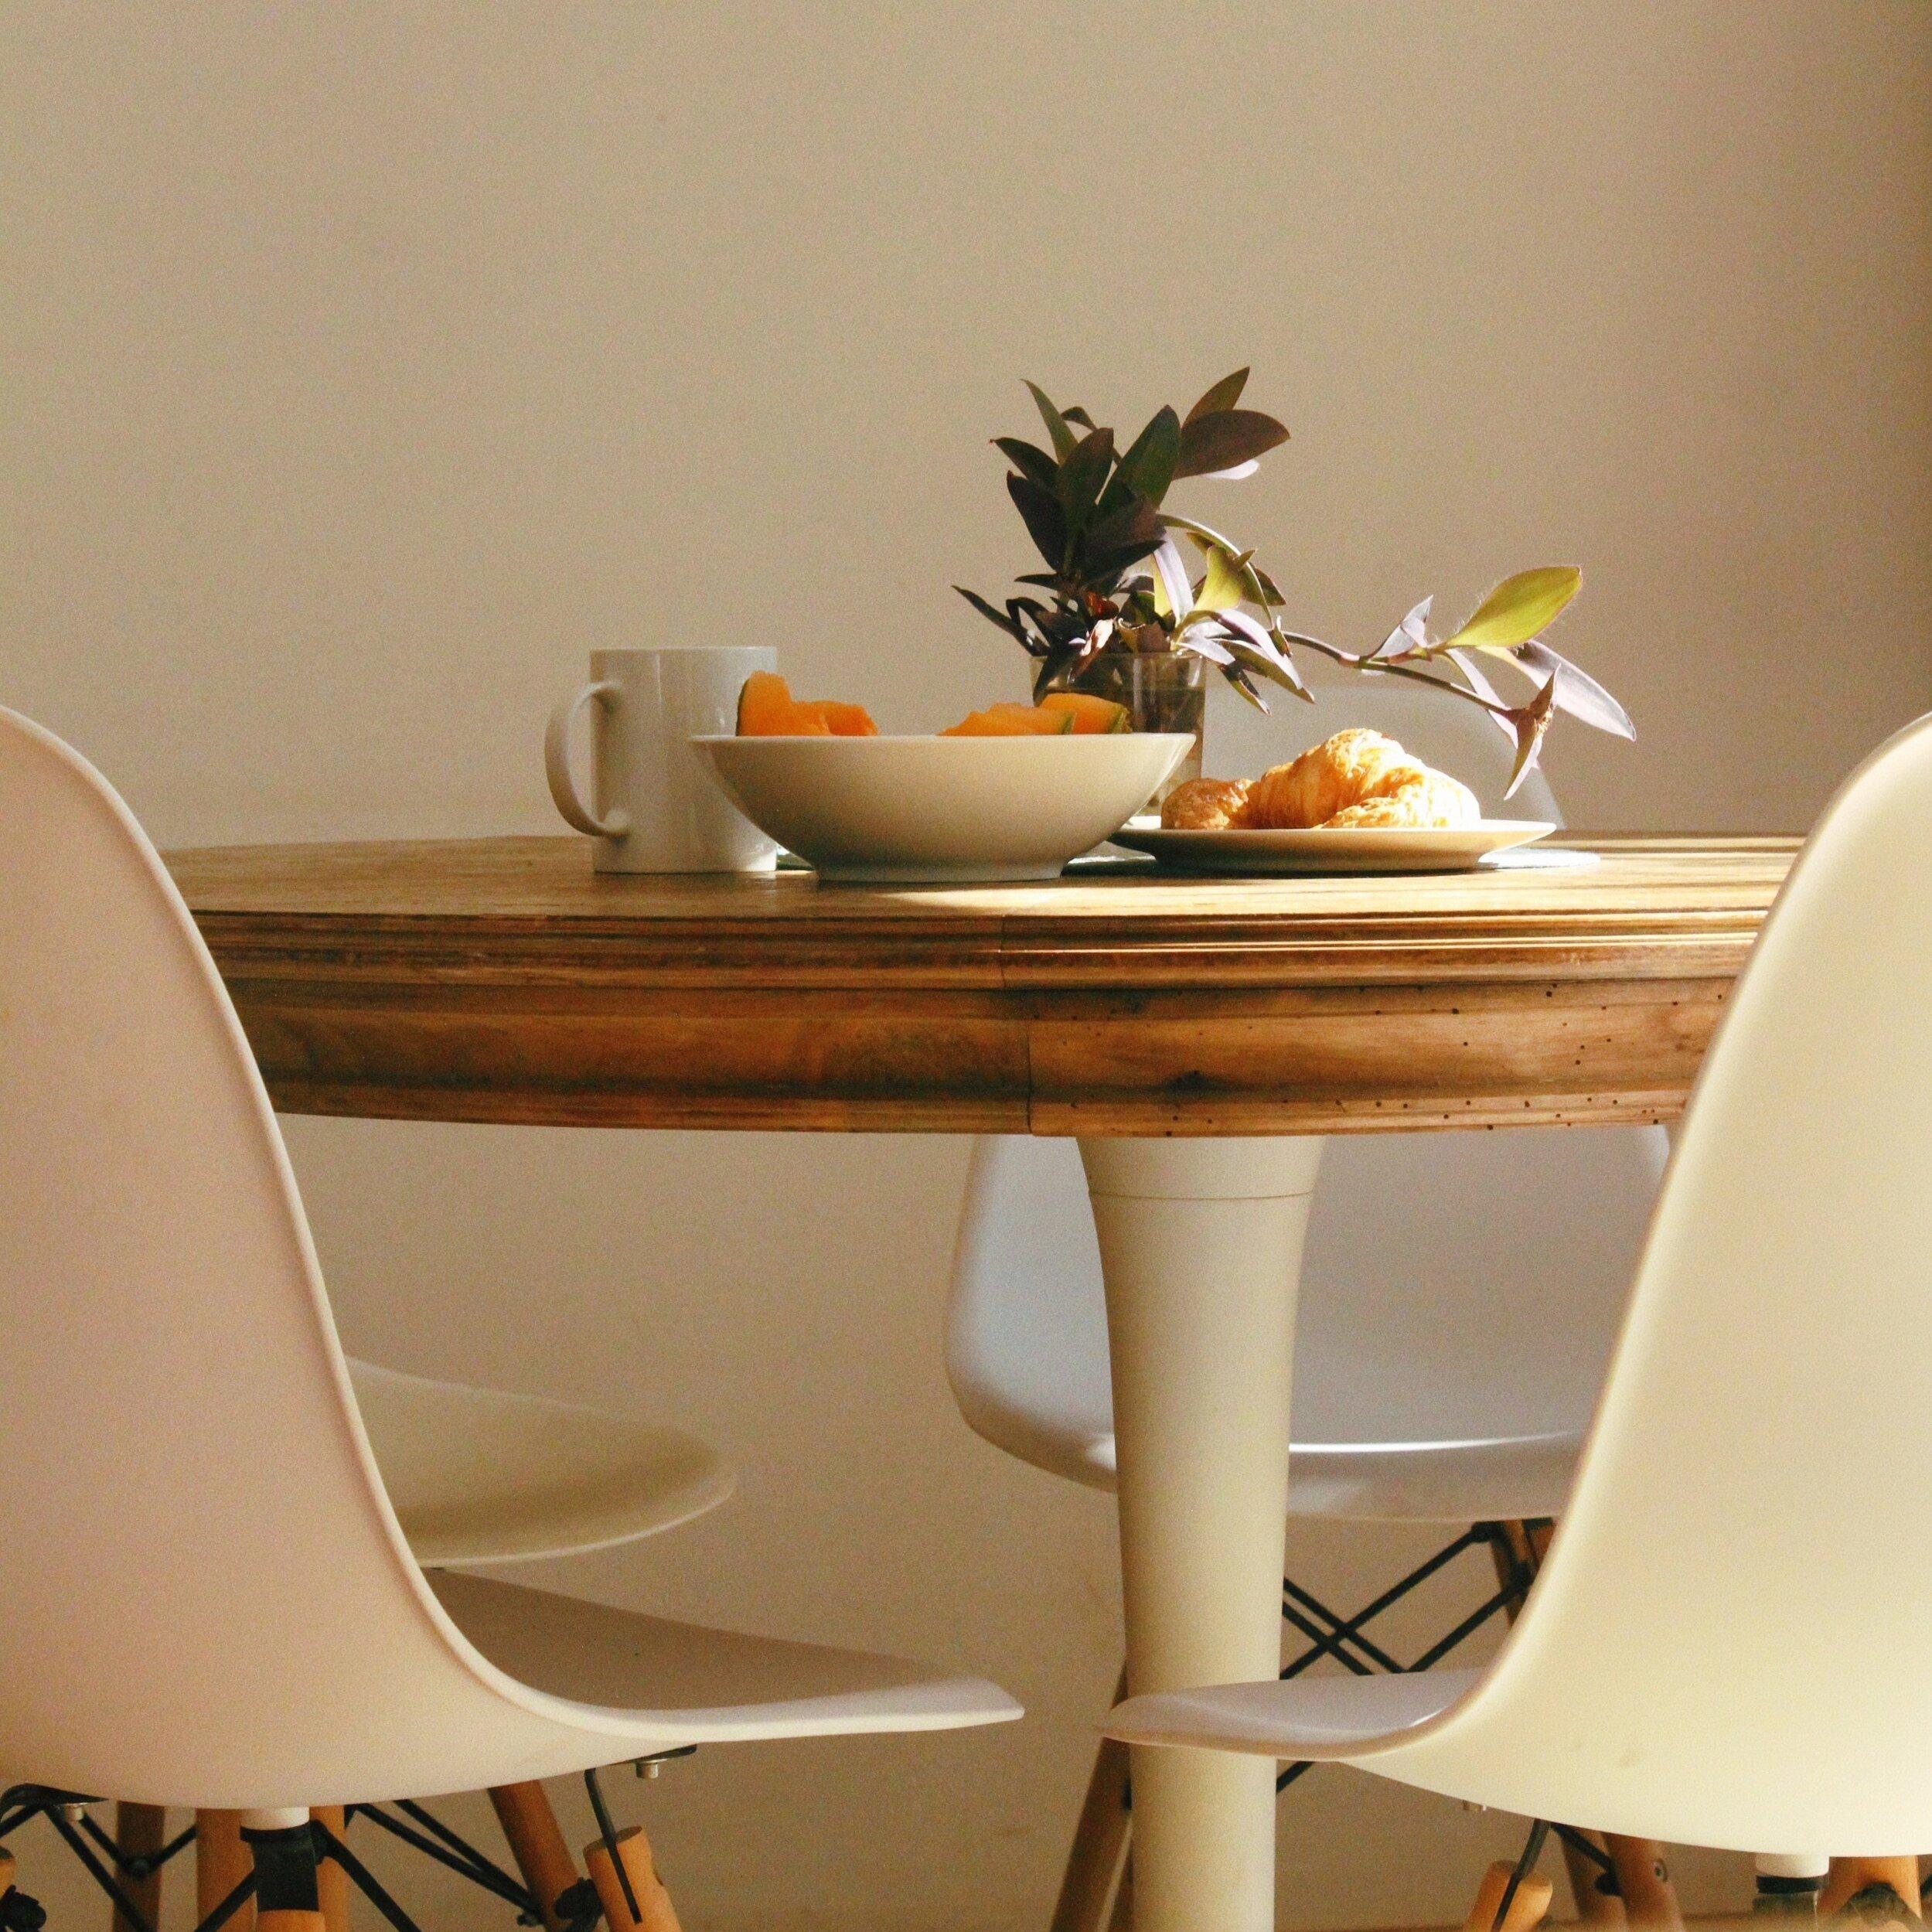 chairs-coffee-dining-table-2930894.jpg